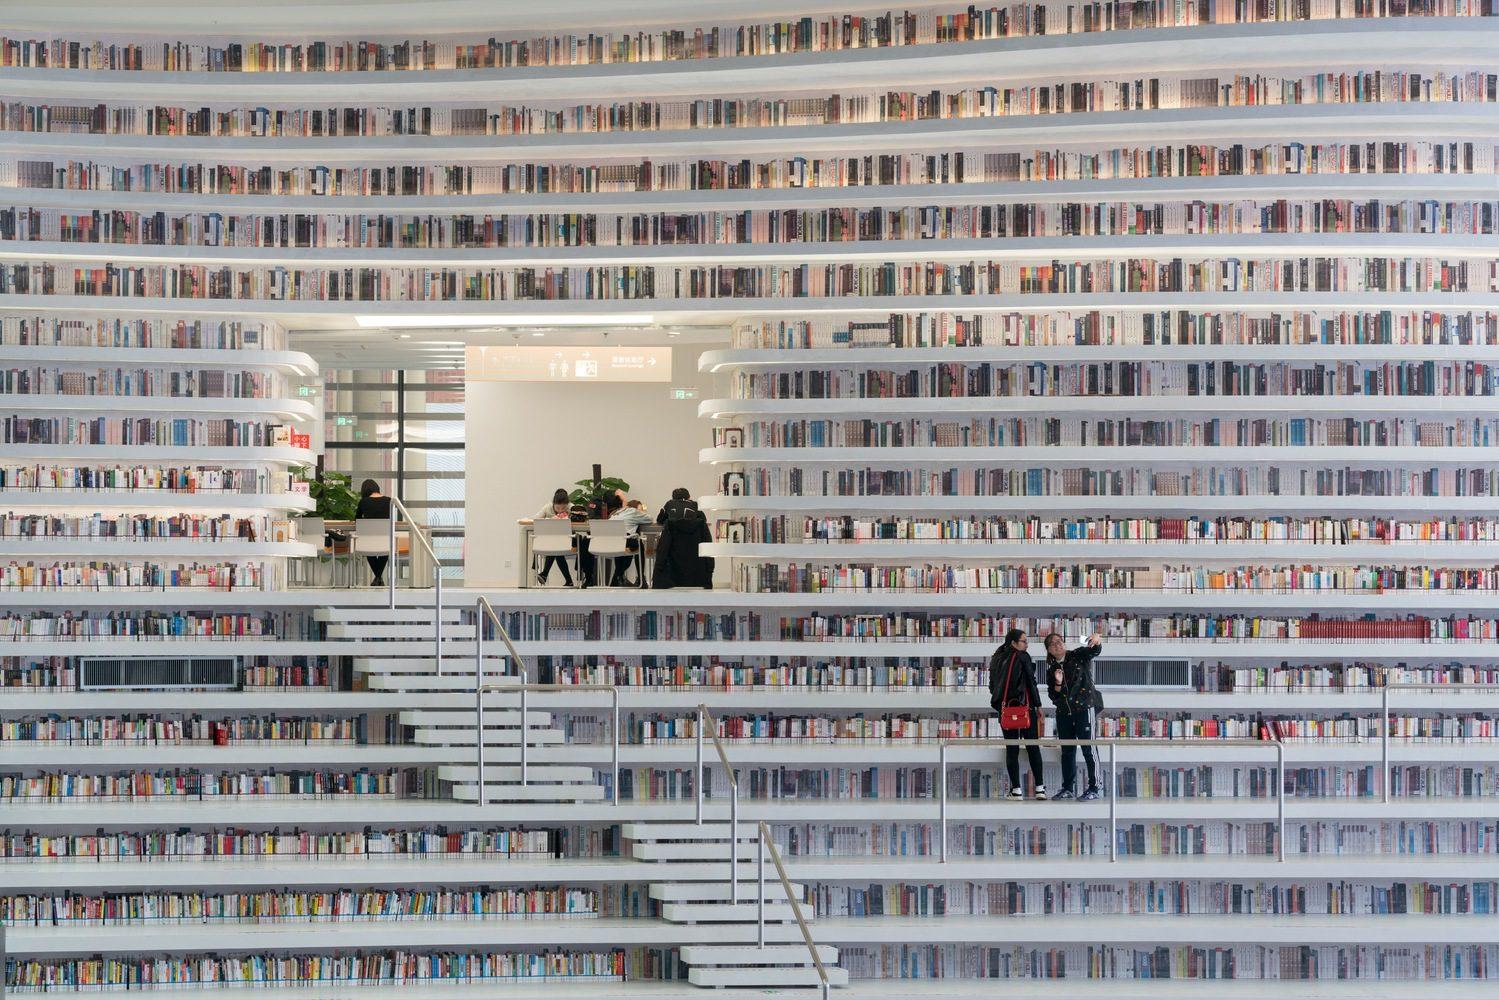 MVRDV - Tianjin Binhai Library - Ossip - IGS Magazine - Projects - 5